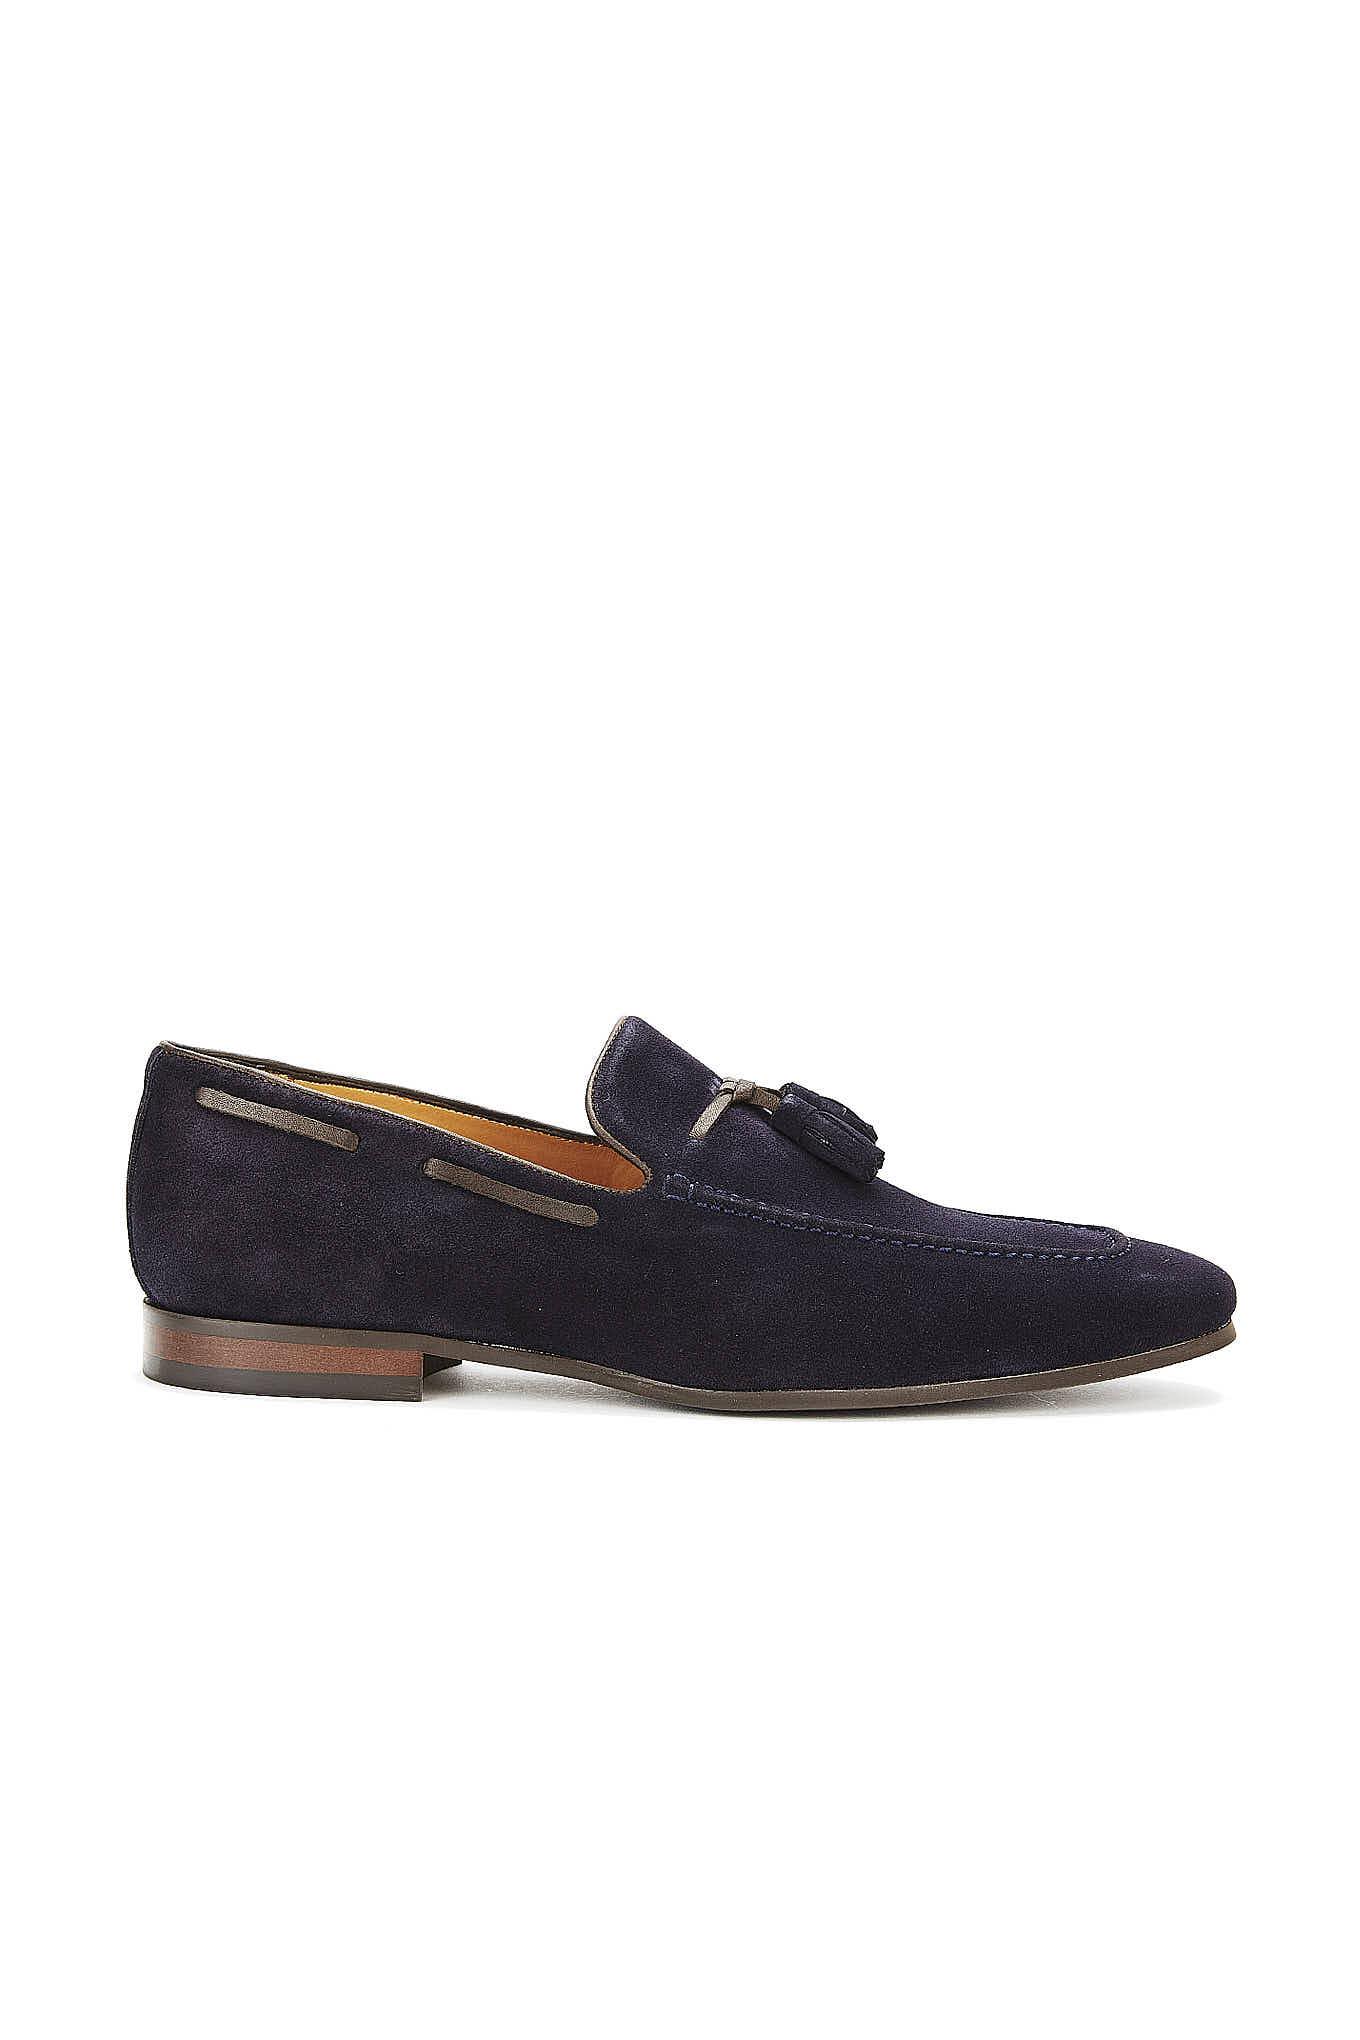 Sapatos Azul Escuro Casual Homem